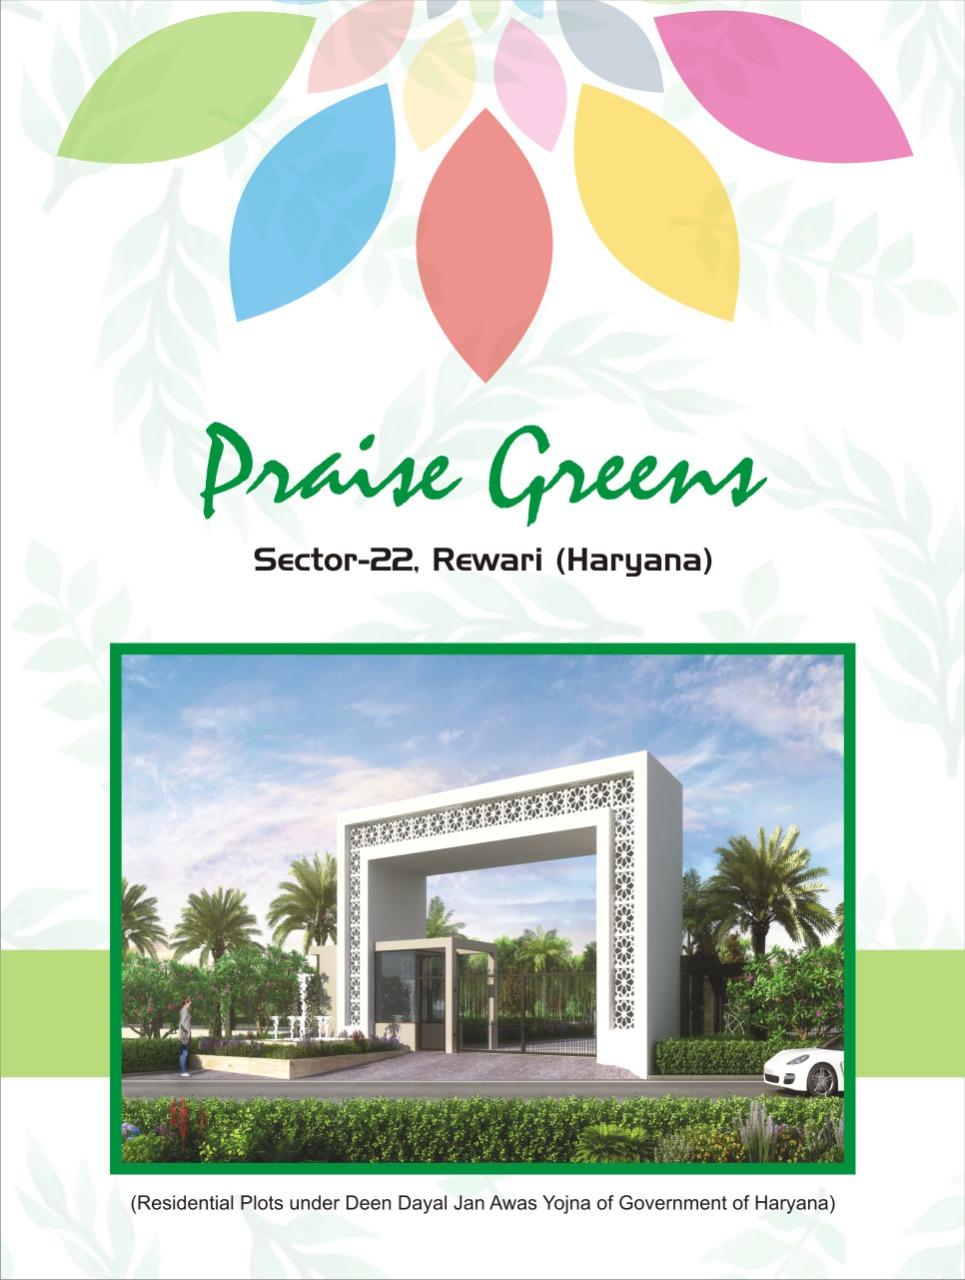 Praise Green